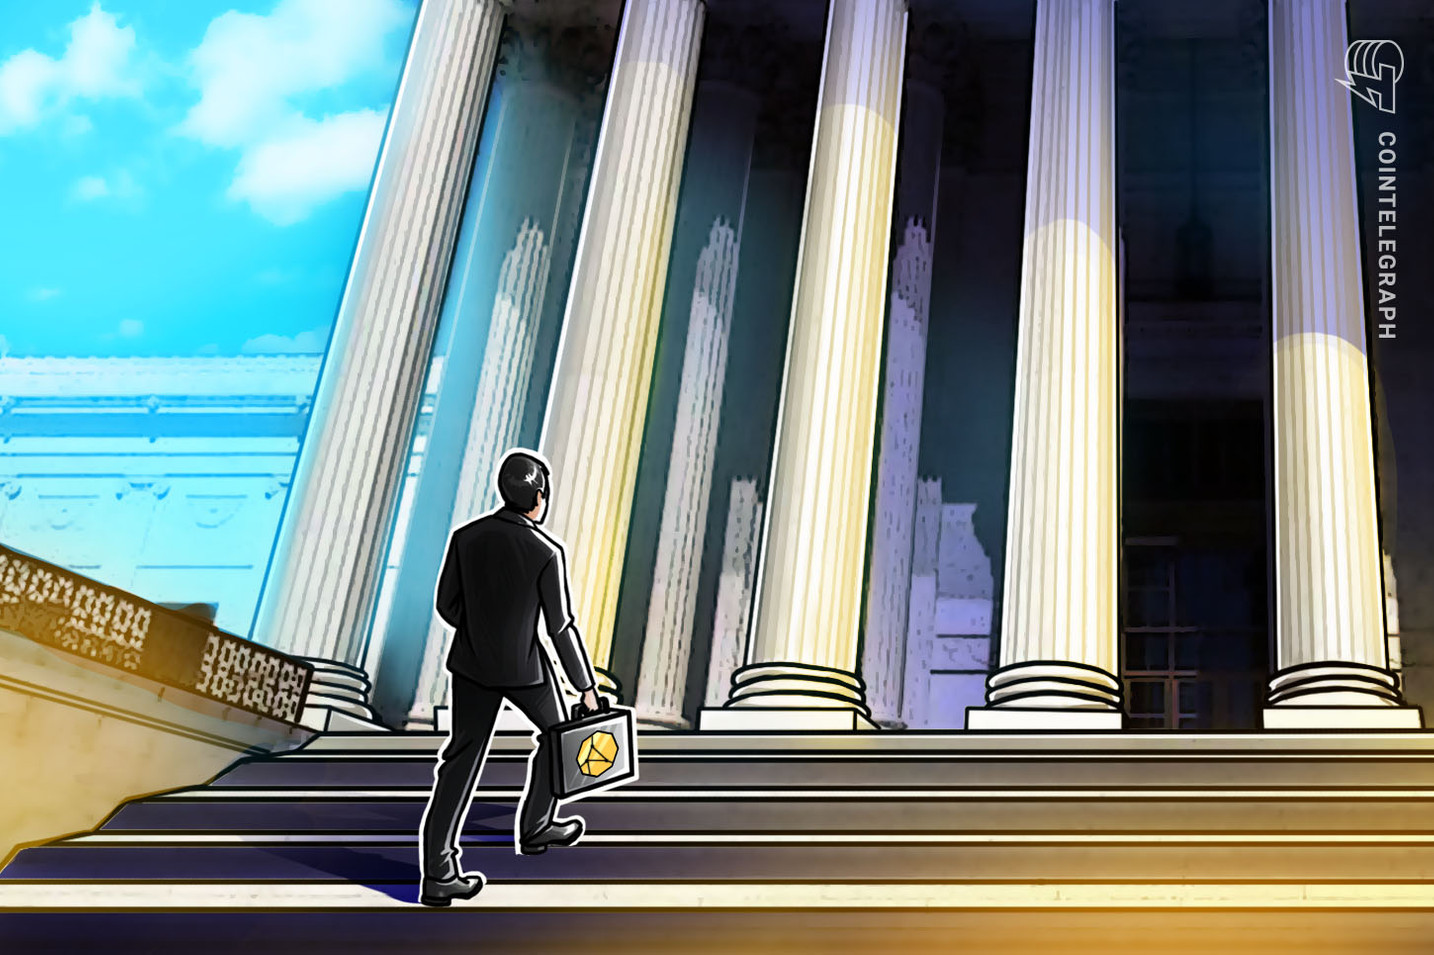 El IRS invita a defensores de las criptomonedas a la cumbre de marzo